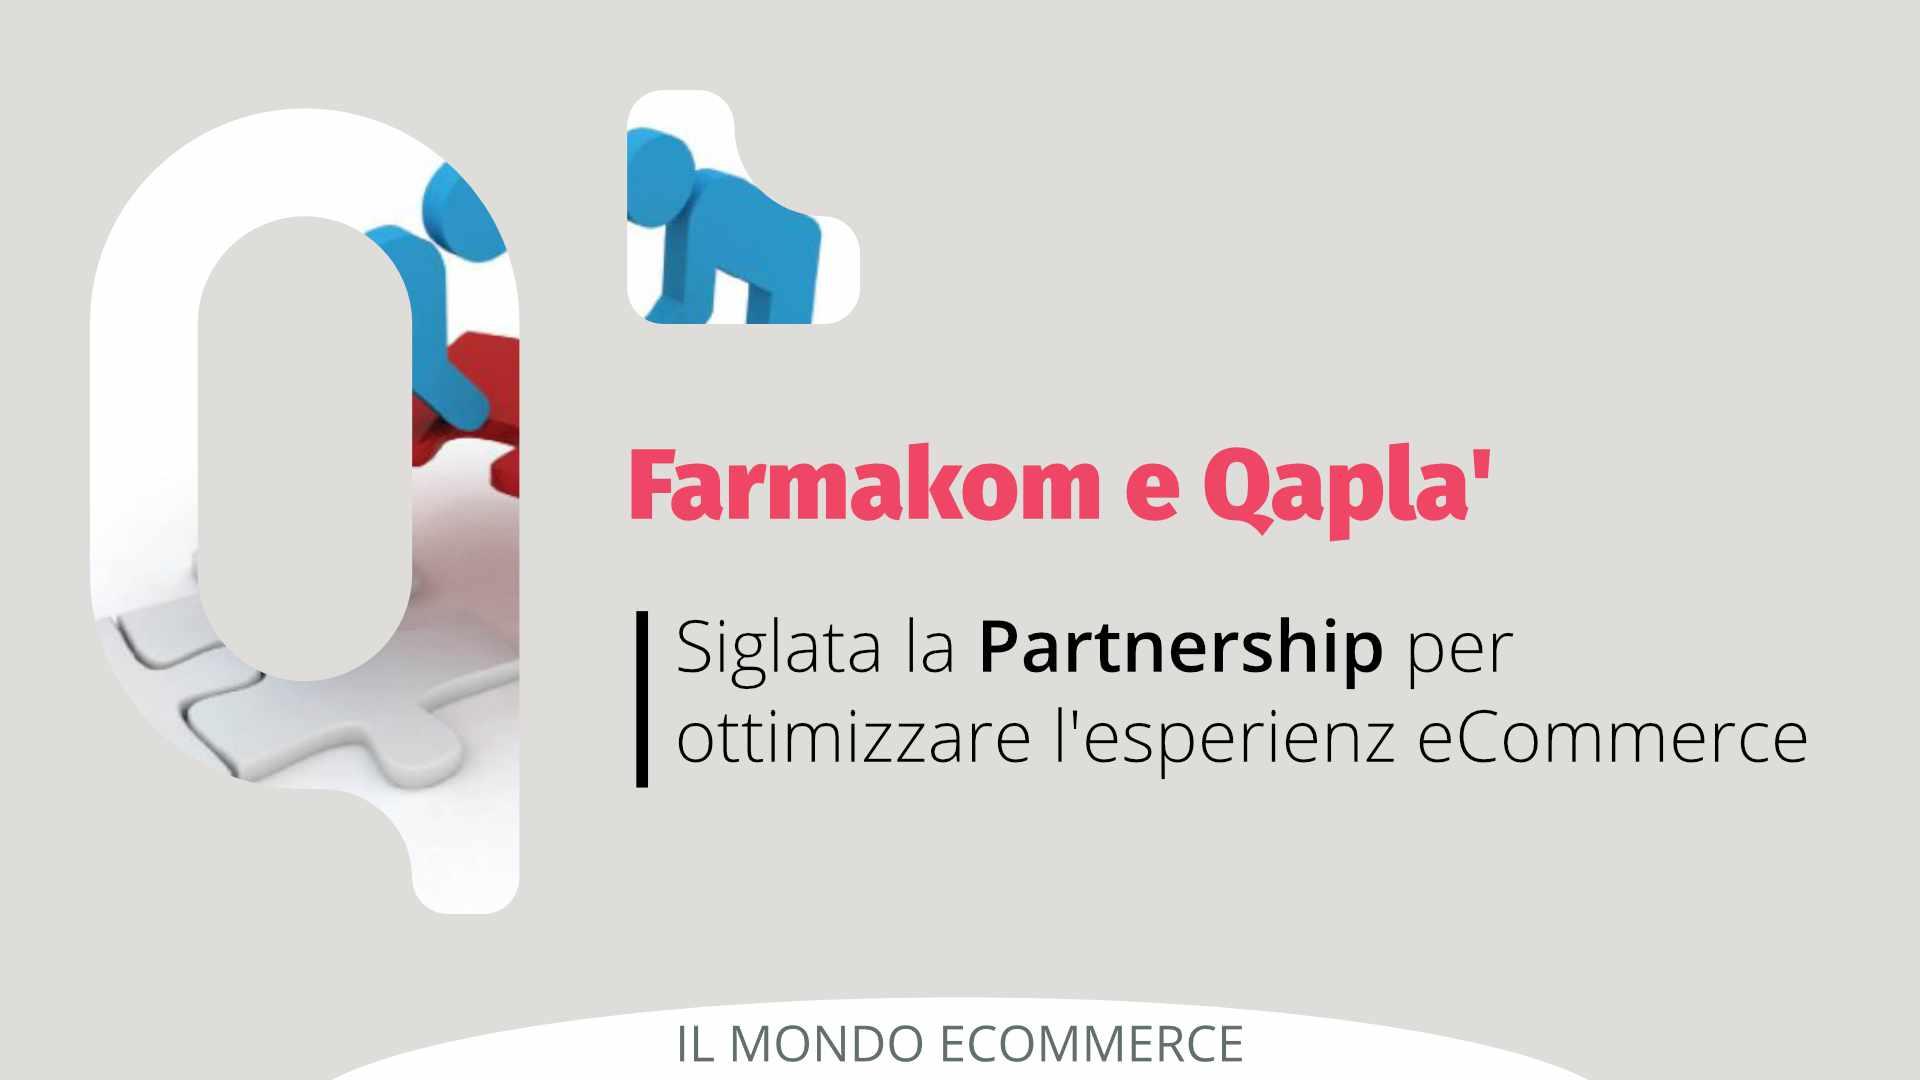 Siglata la Partnership tra Farmakom e Qapla'